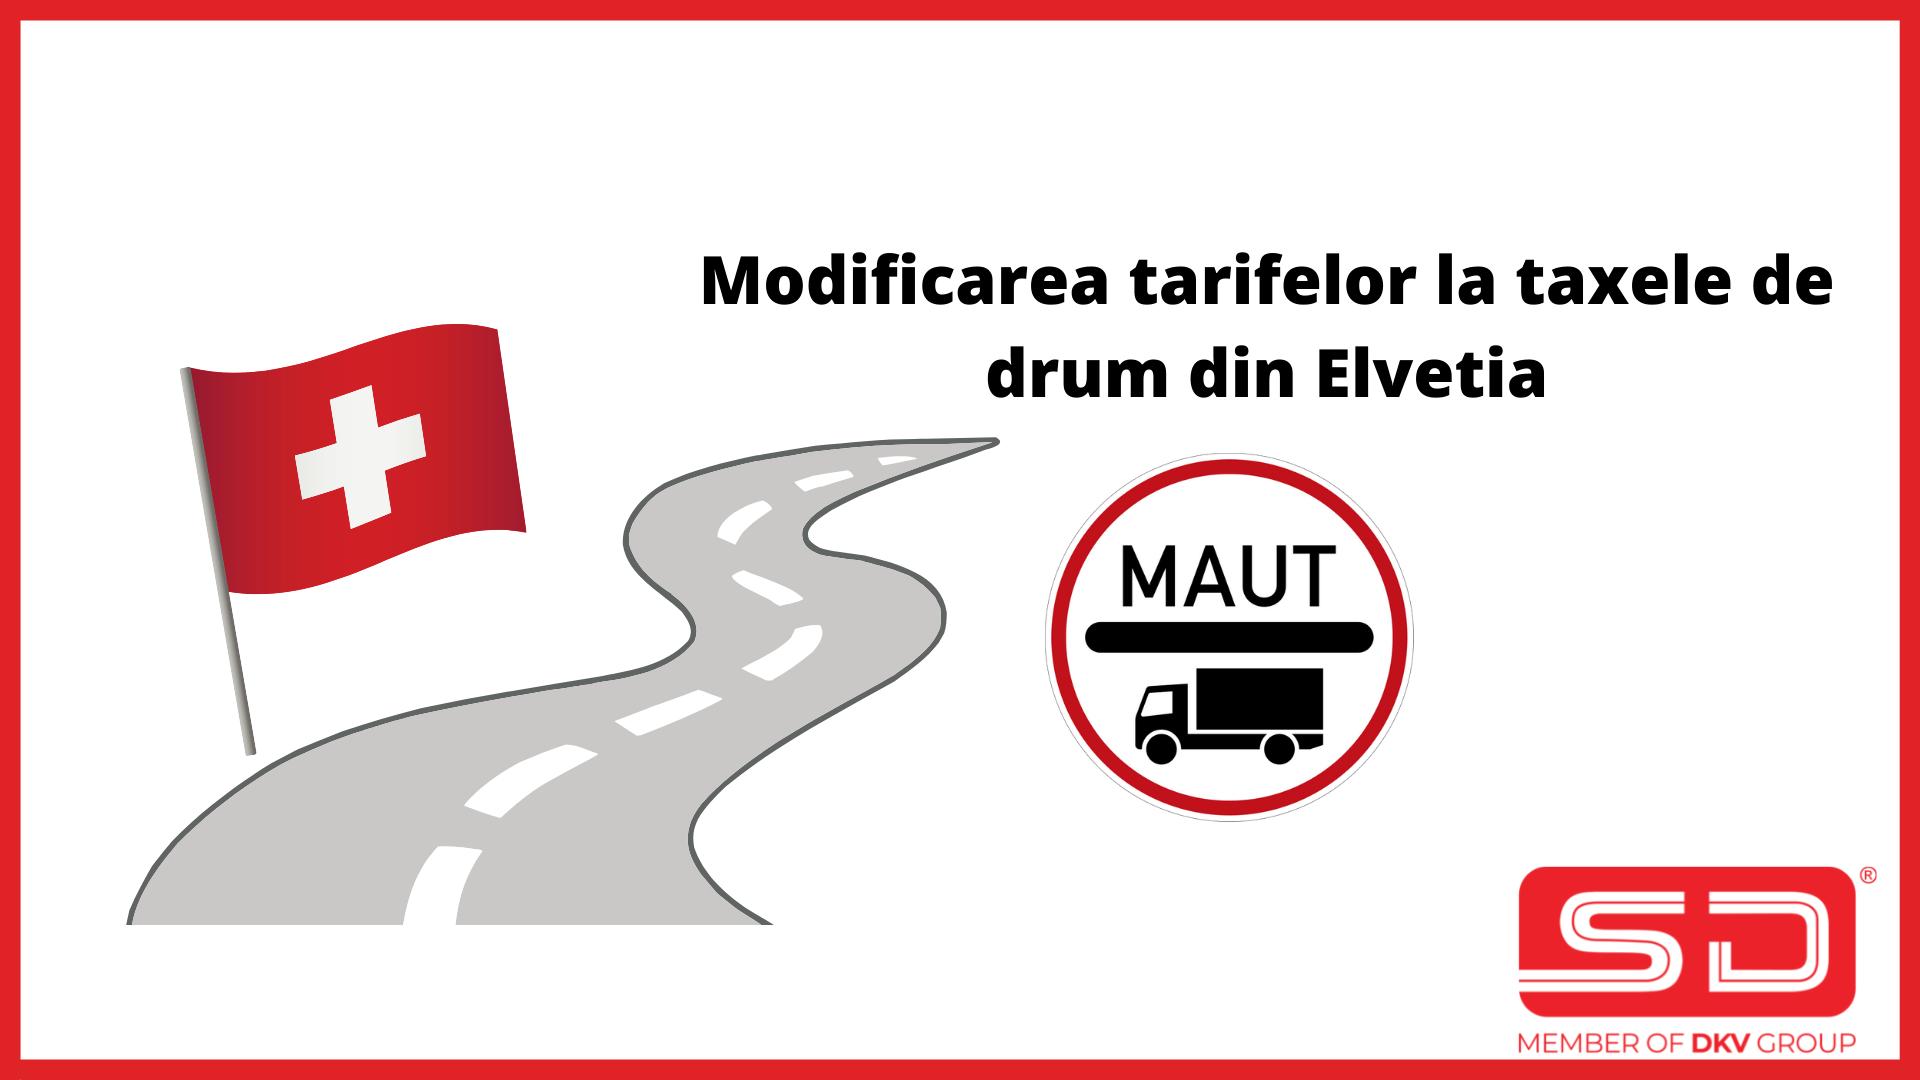 Modificare tarife taxe drum Elvetia de la 1 Iulie 2021